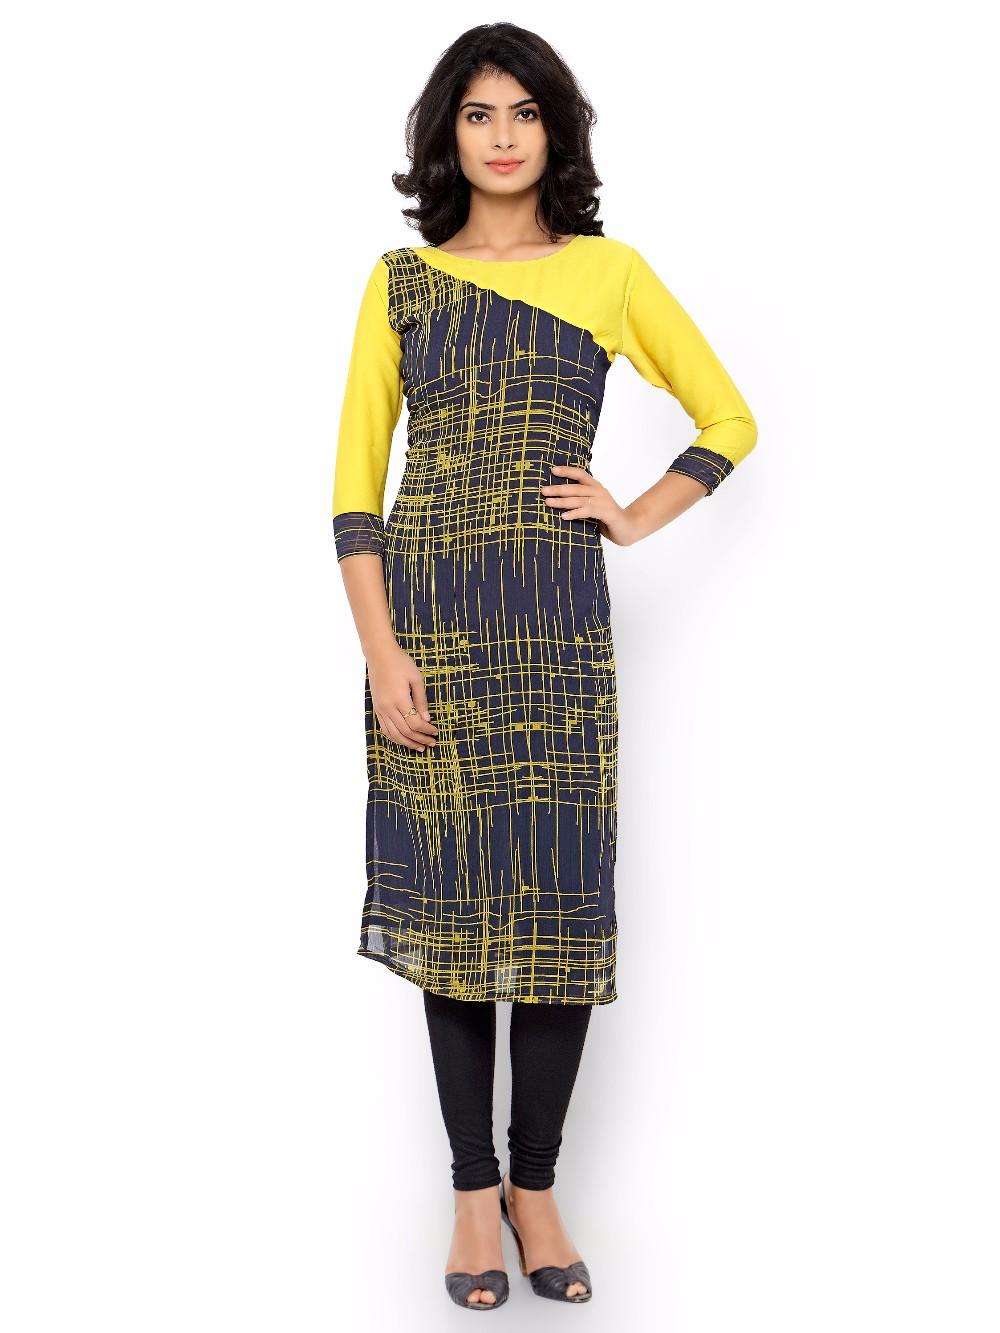 Kurti design 2017 - 2017 New Design Yellow And Black Gergette Women Kurti